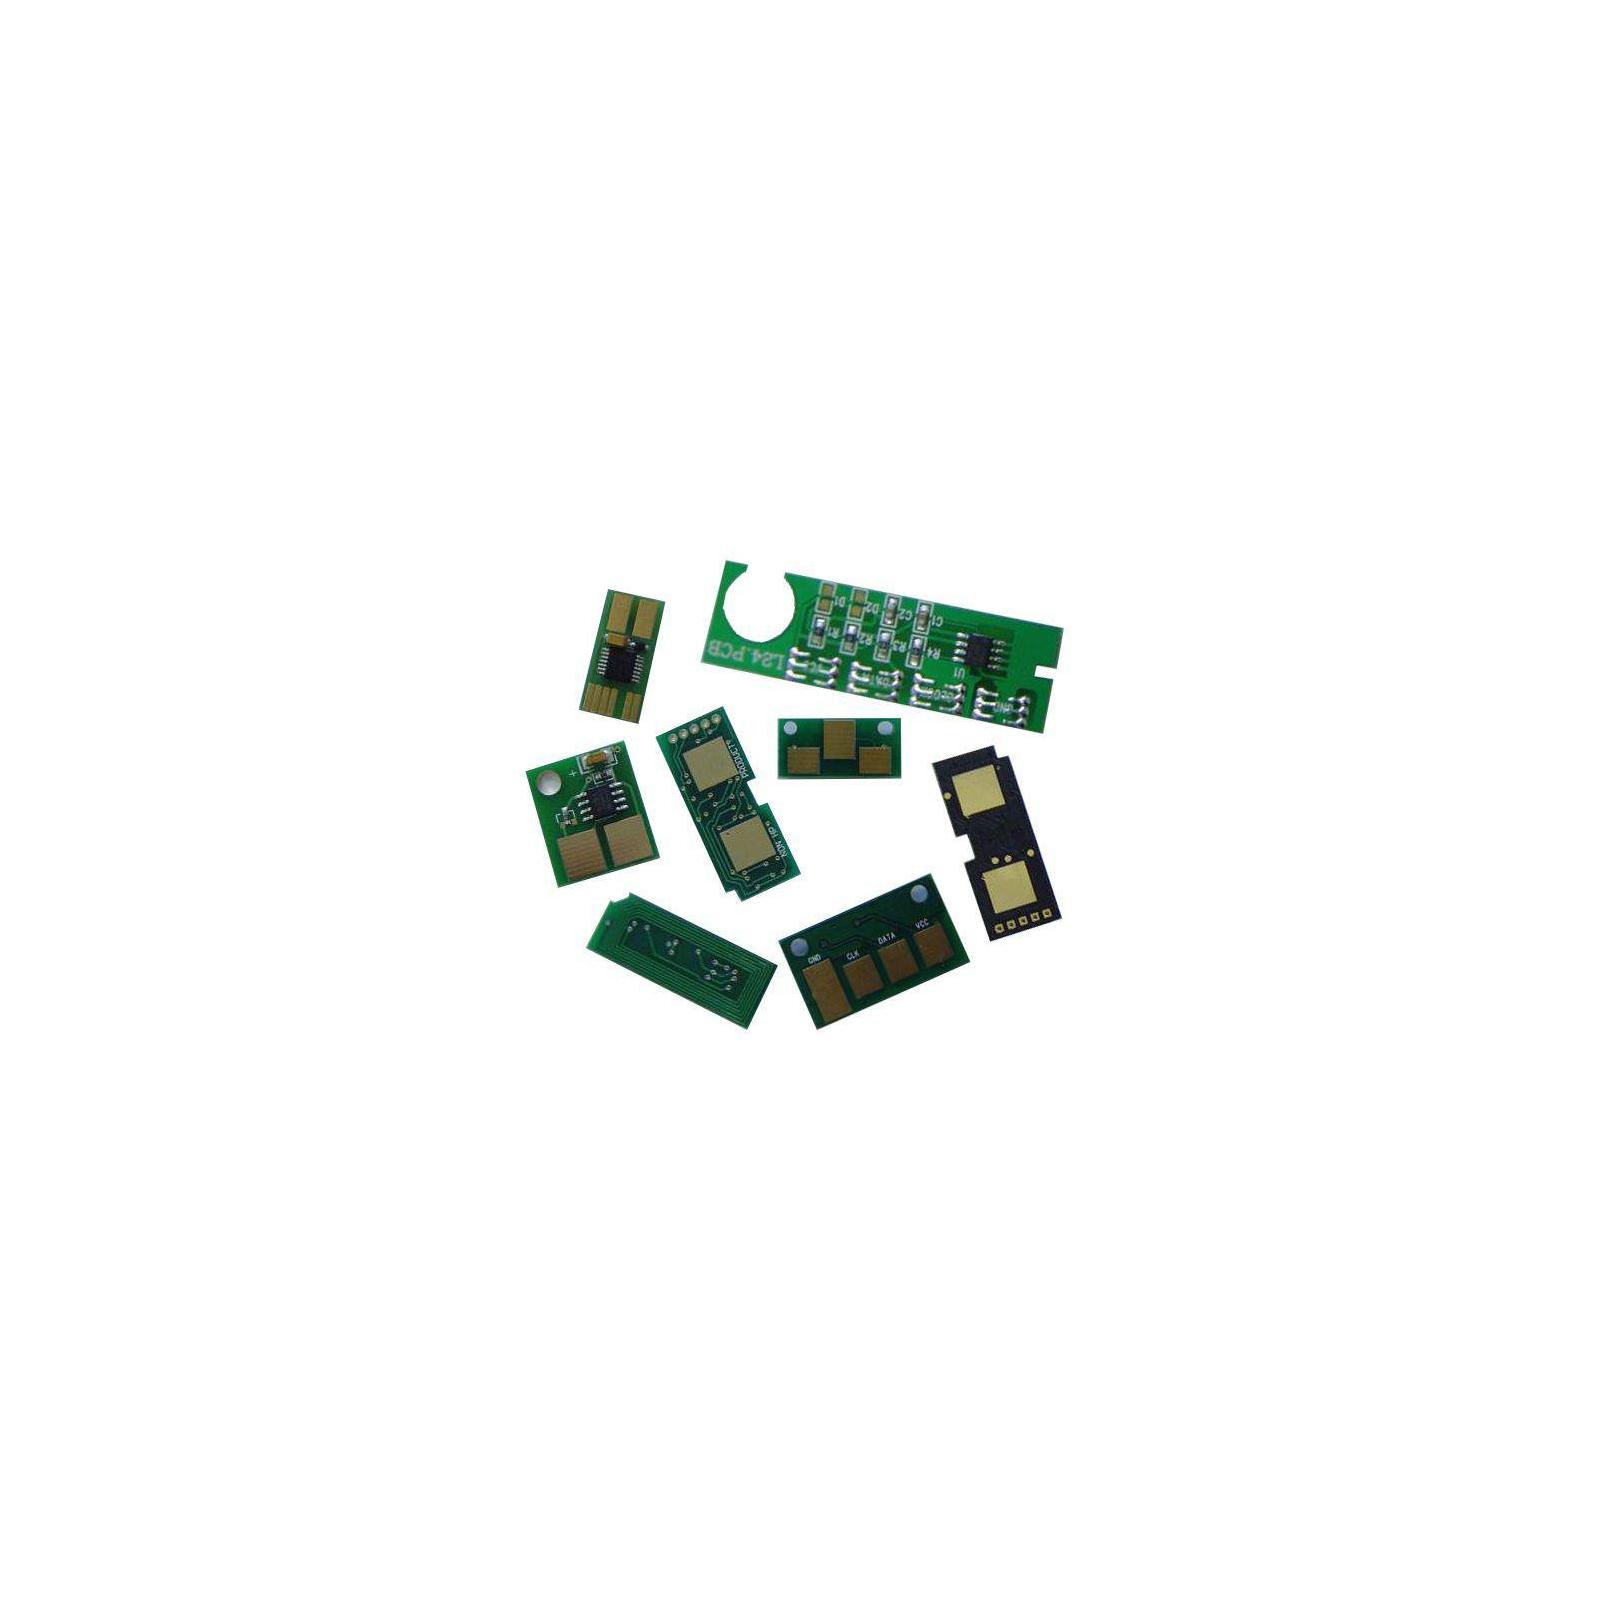 Чип для картриджа EPSON T1303 ДЛЯ SX525/620 MAGENTA Apex (CHIP-EPS-T1303-M)